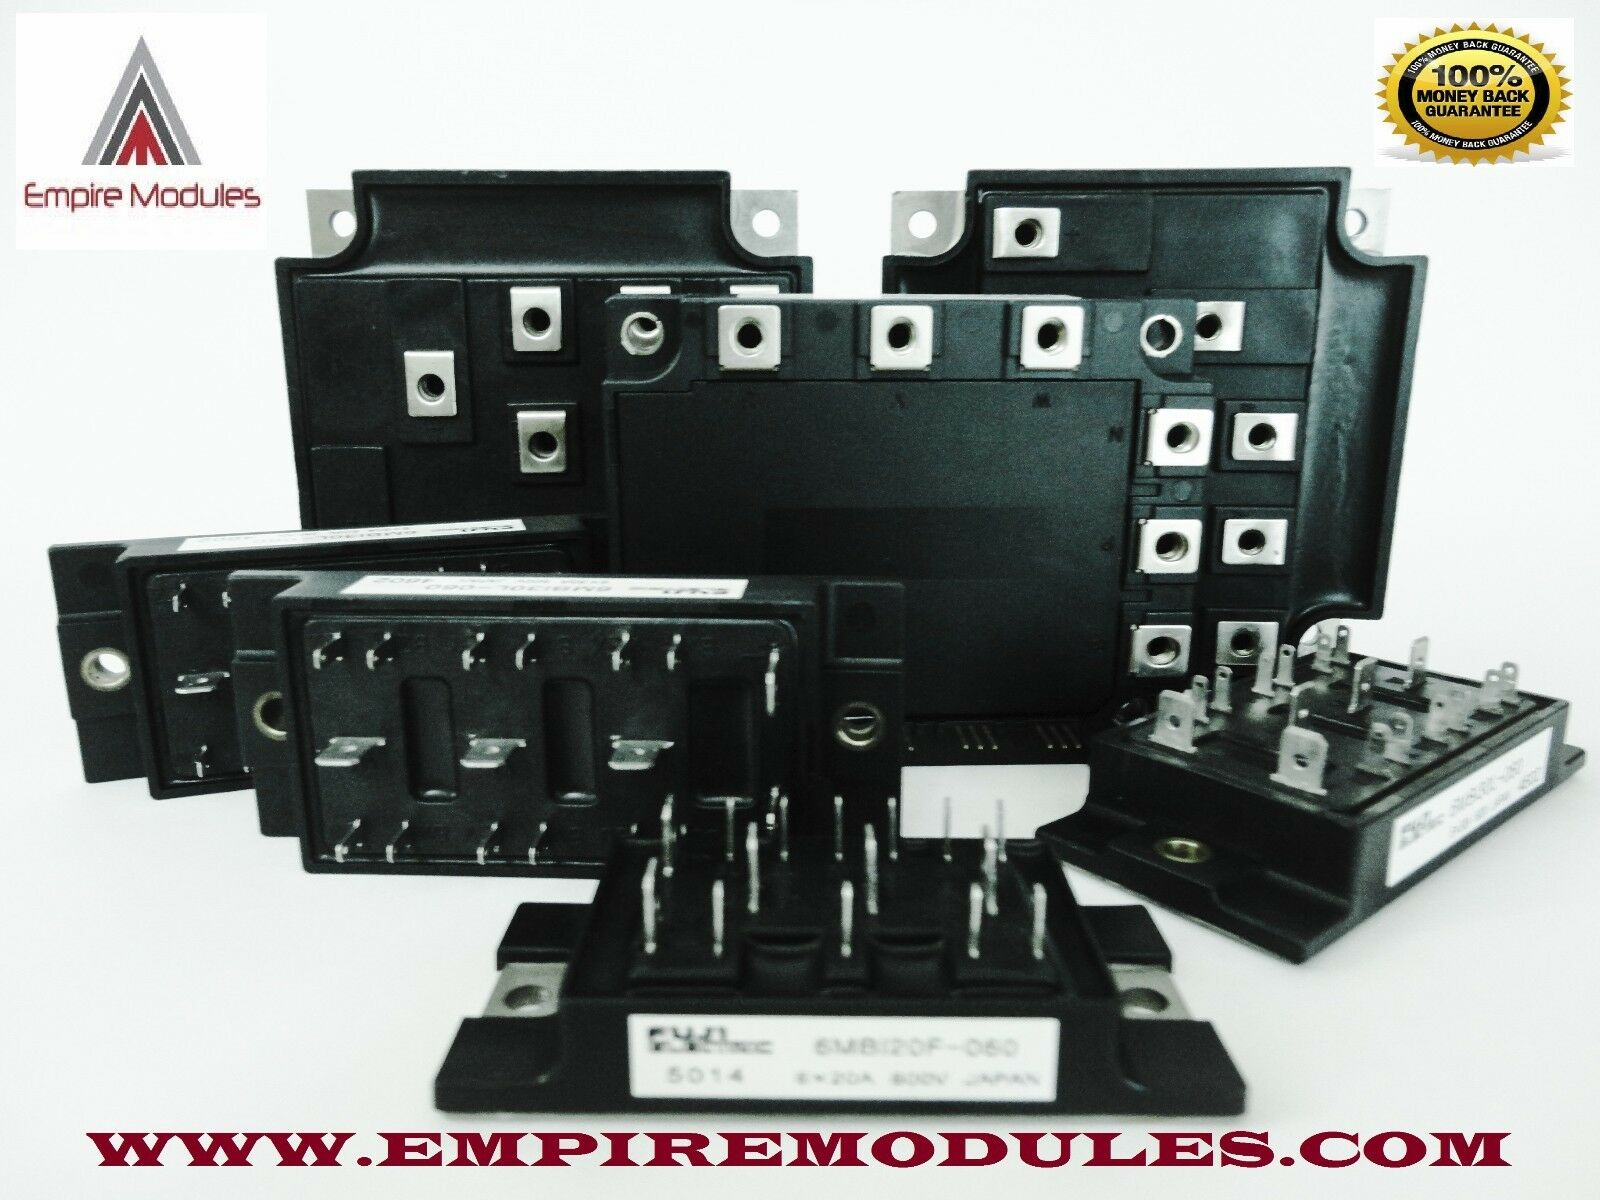 NEW MODULE FZ900R12KF1 EUPEC MODULE ORIGINAL